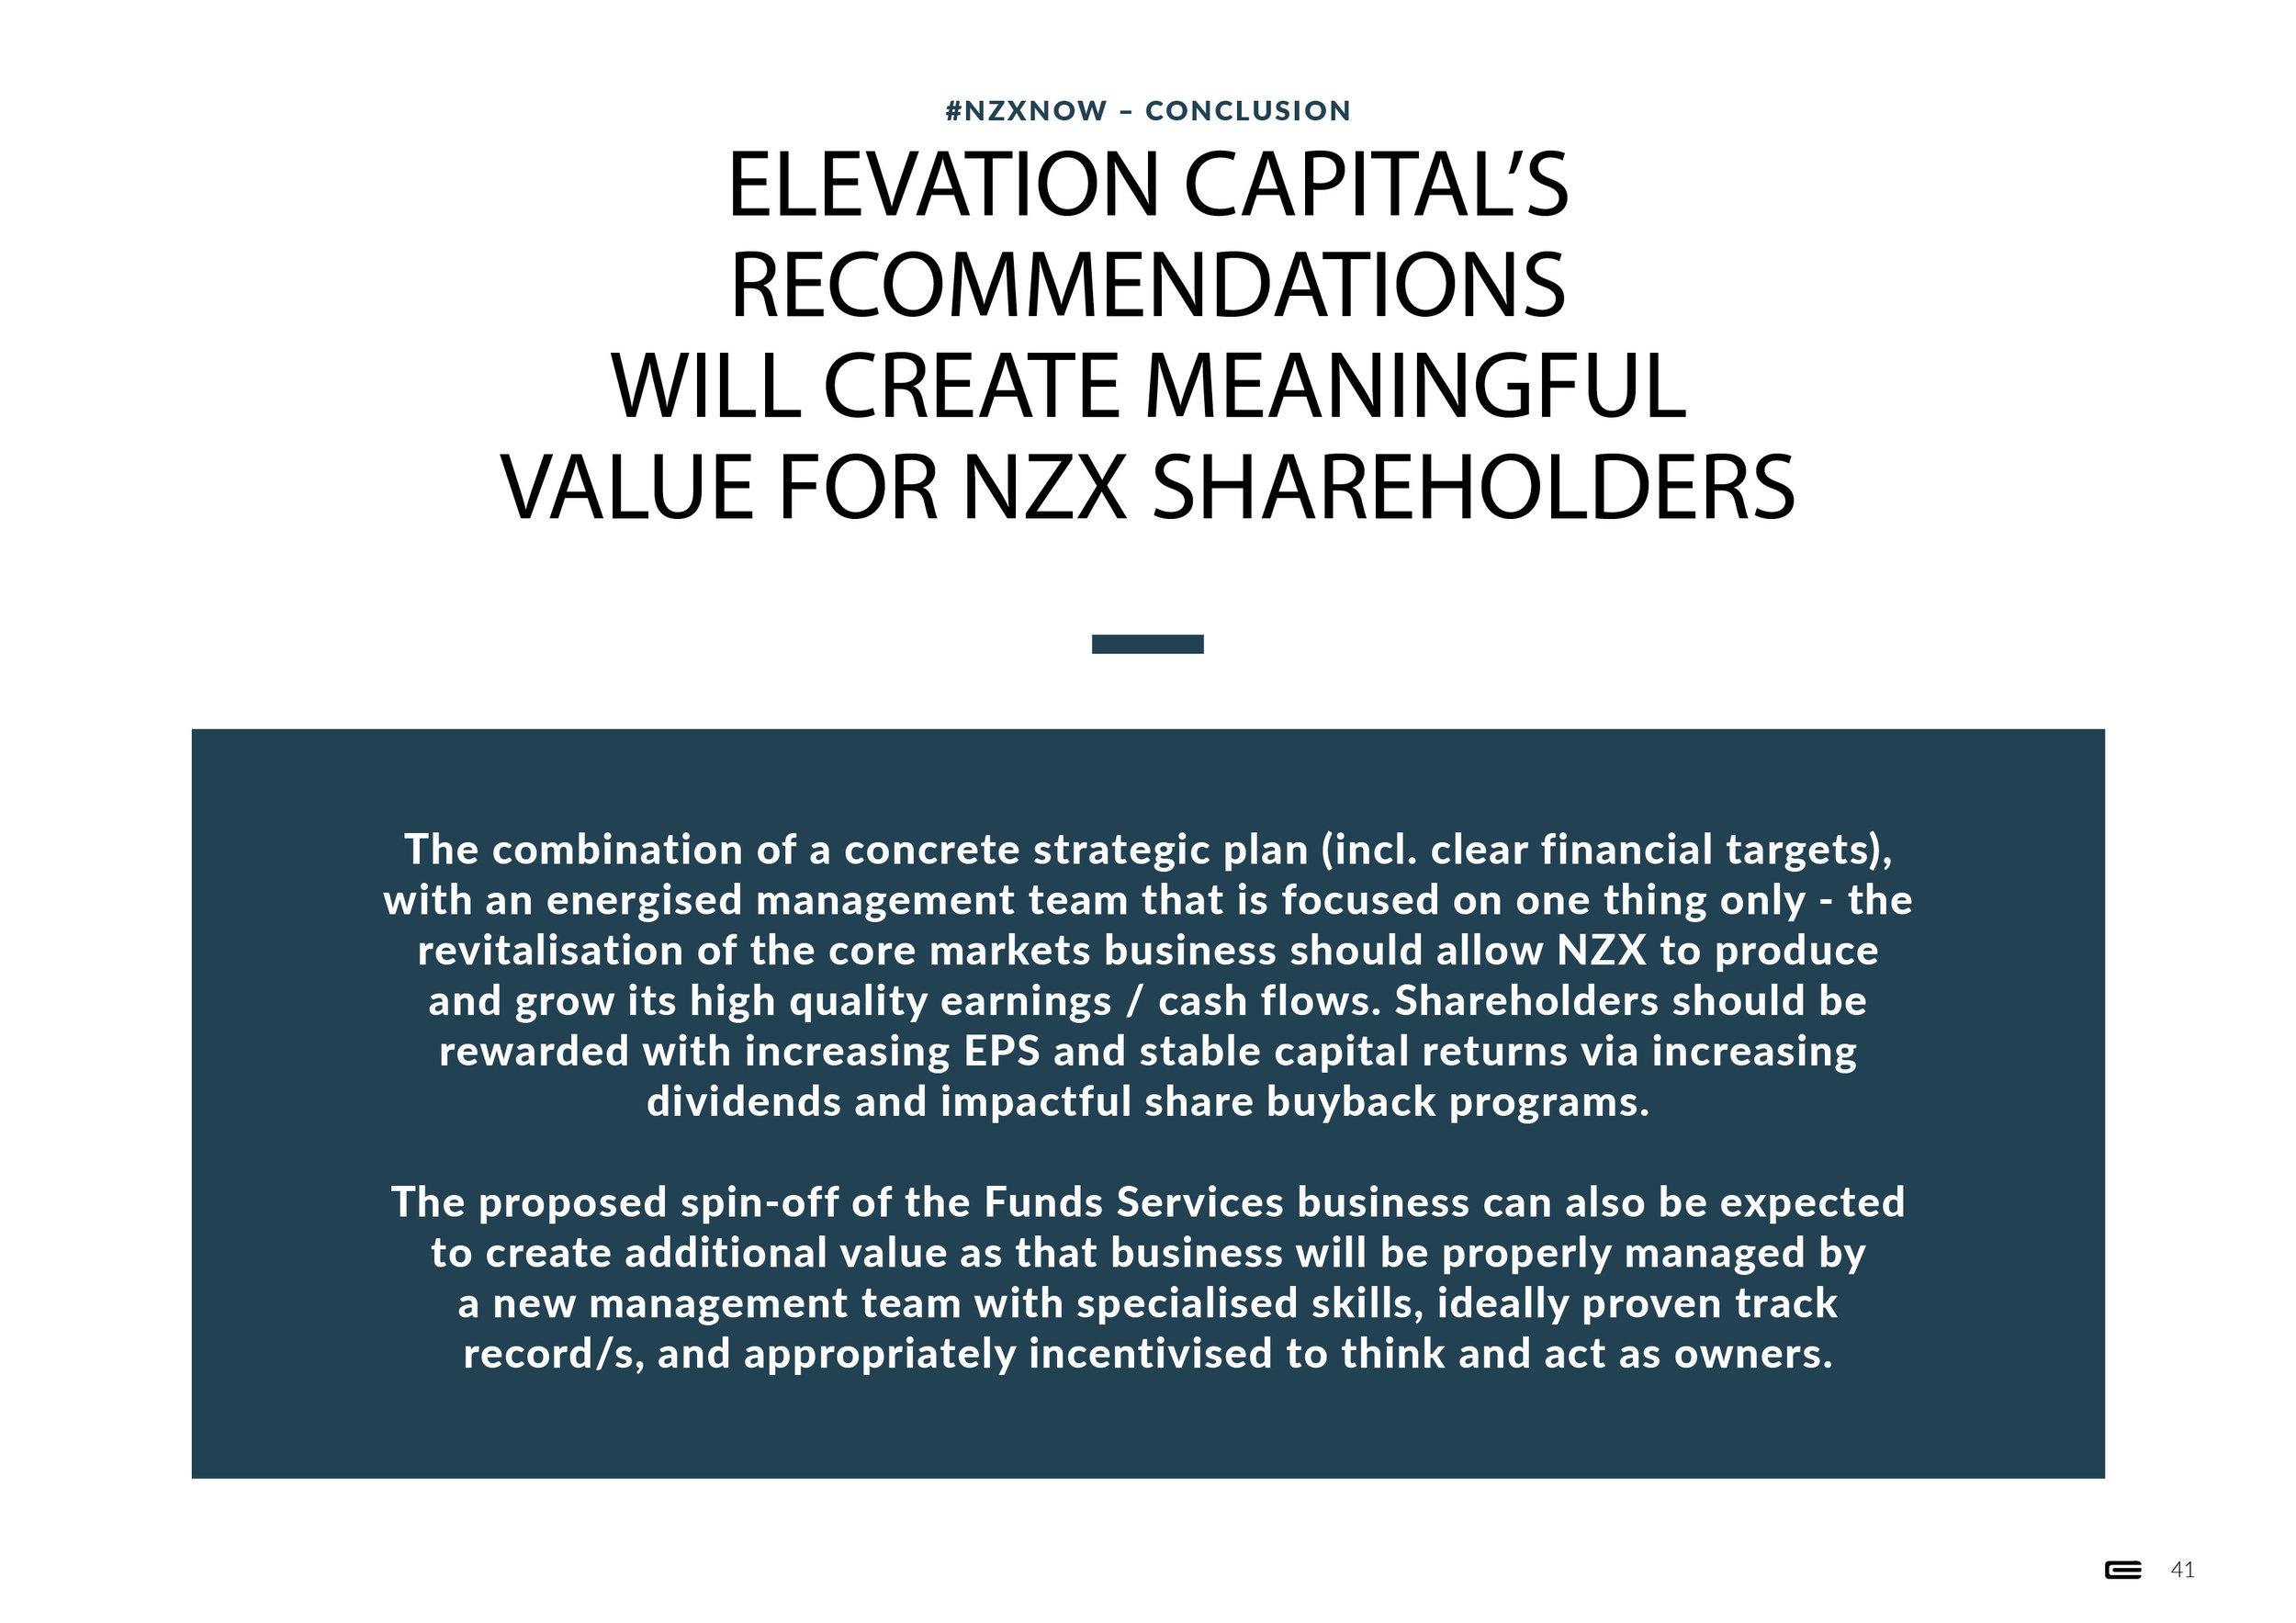 #NZXNOW - Presentation - 1 October 201841.jpg